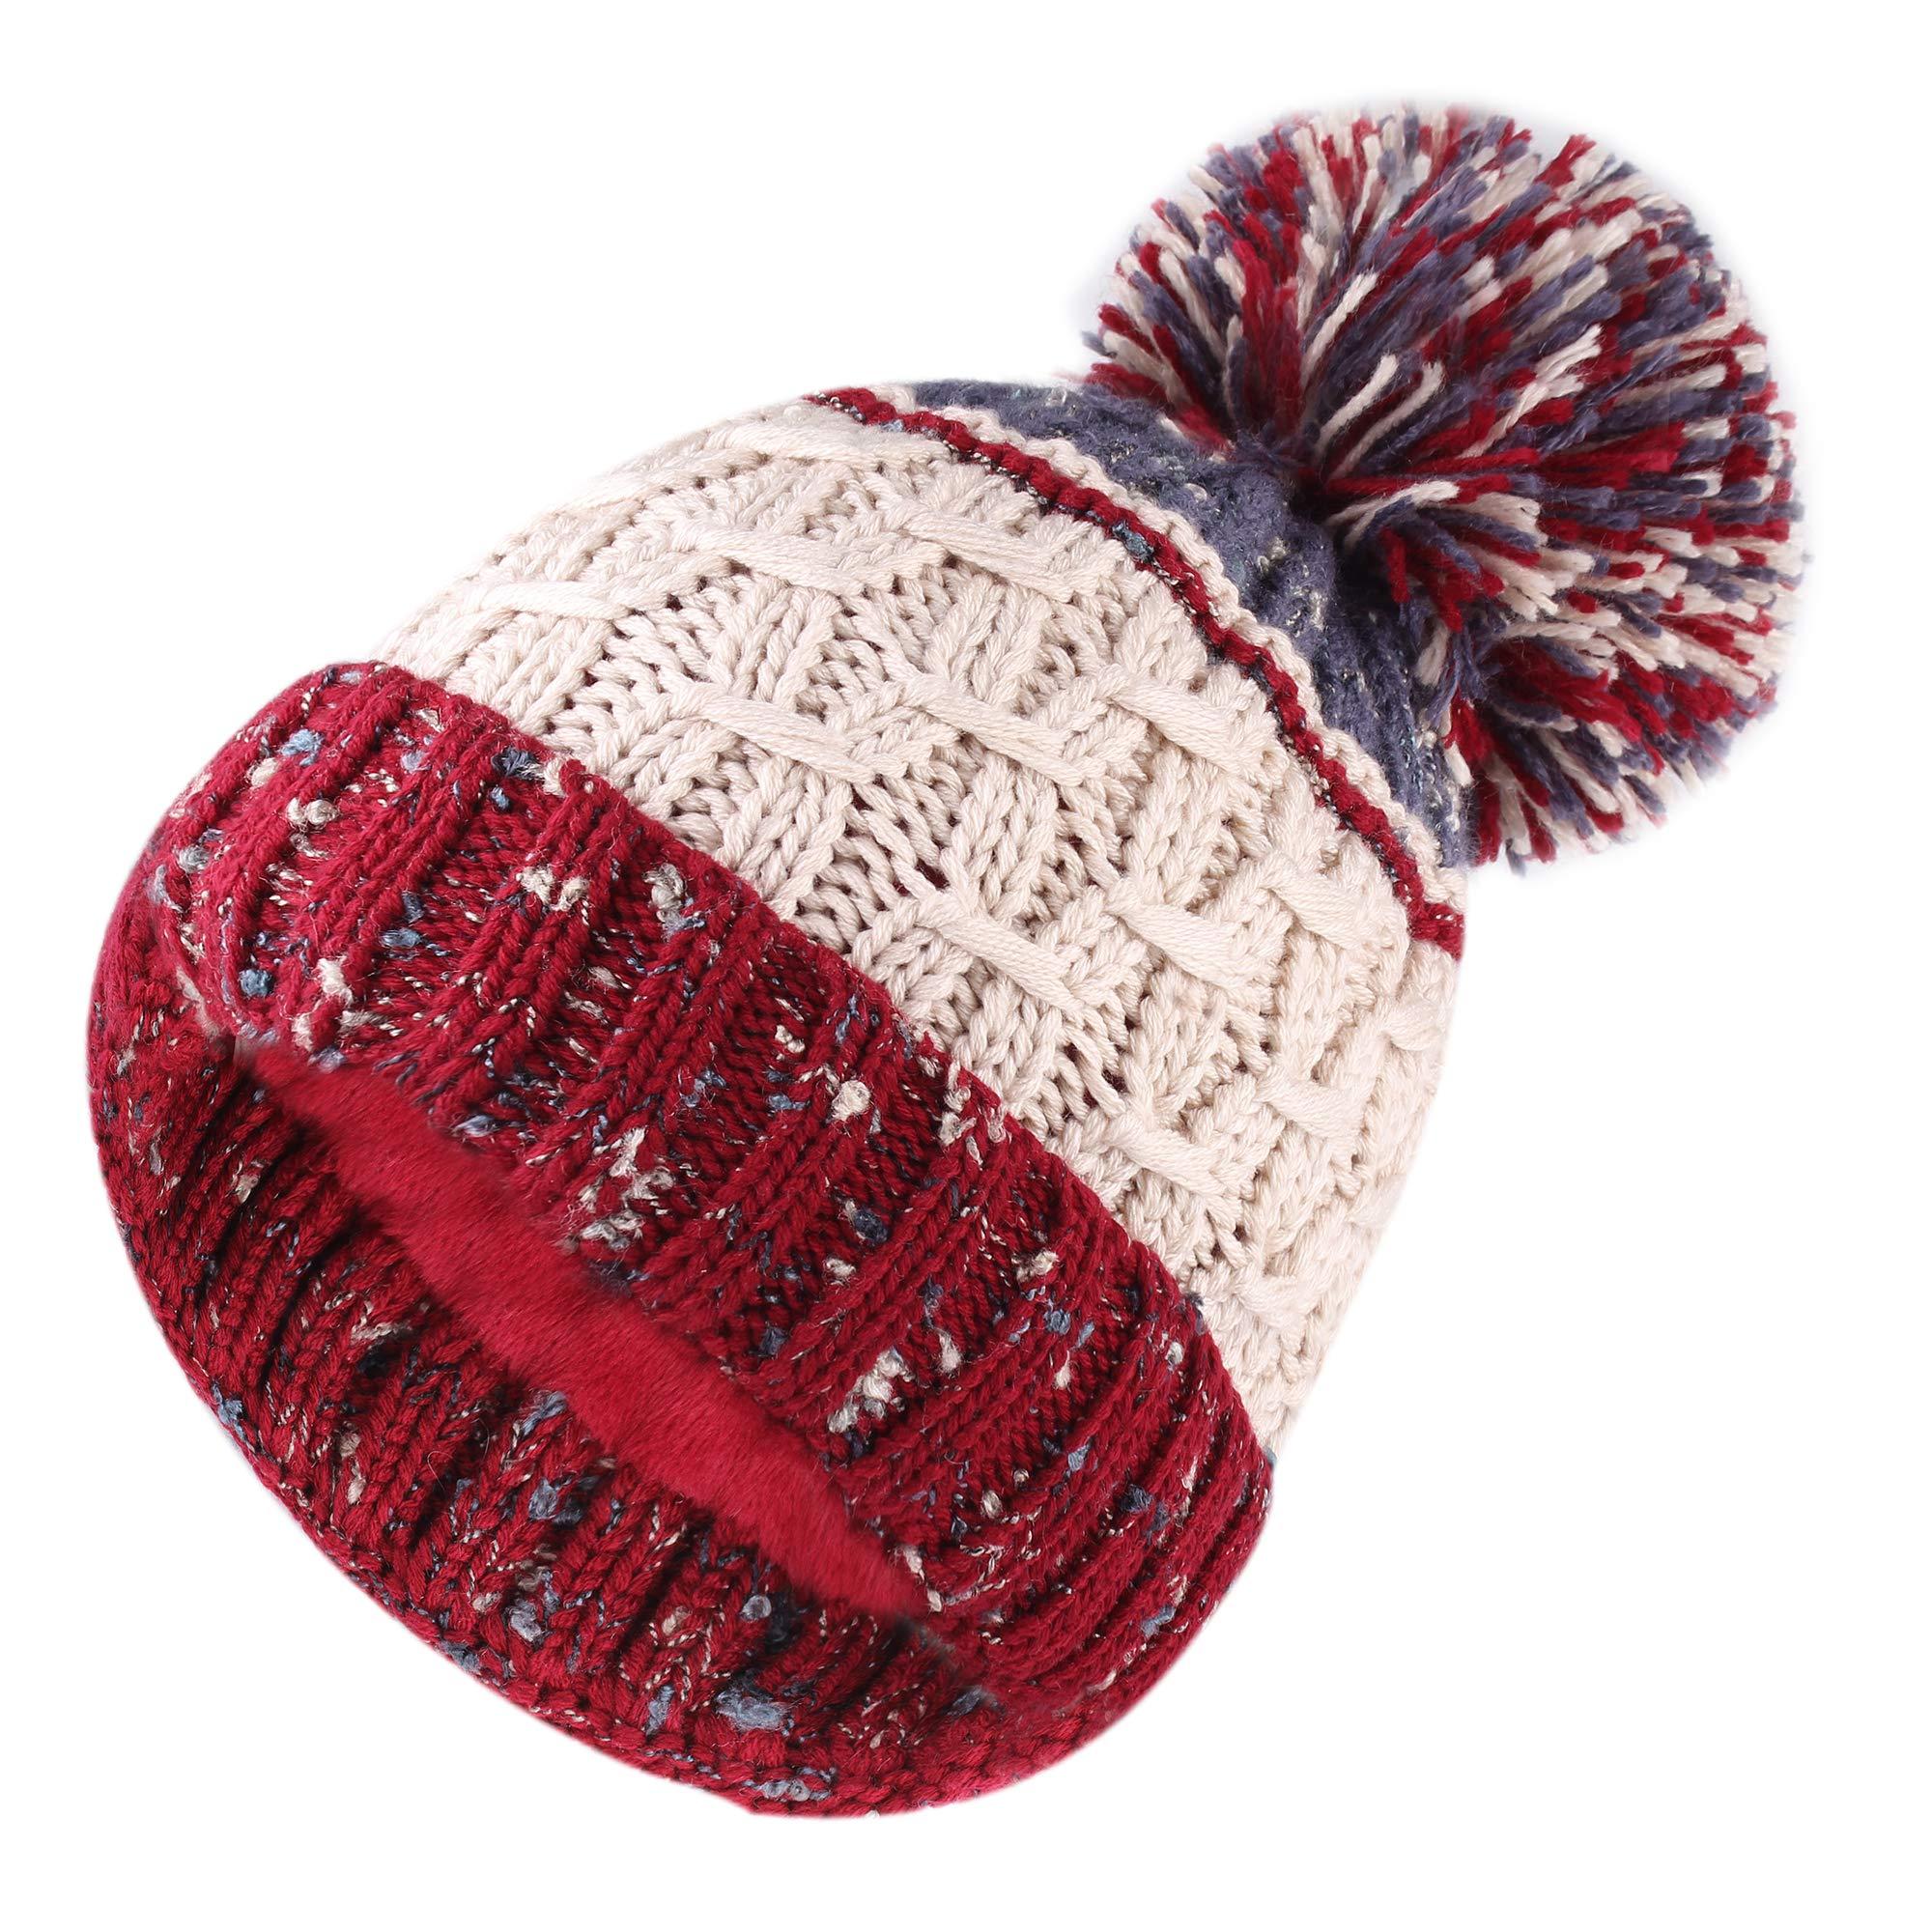 720d23cf14d FURTALK Winter Pom Poms Beanie Hat for Womens Girls Warm Lining Knit Ski Cap  Wine Red